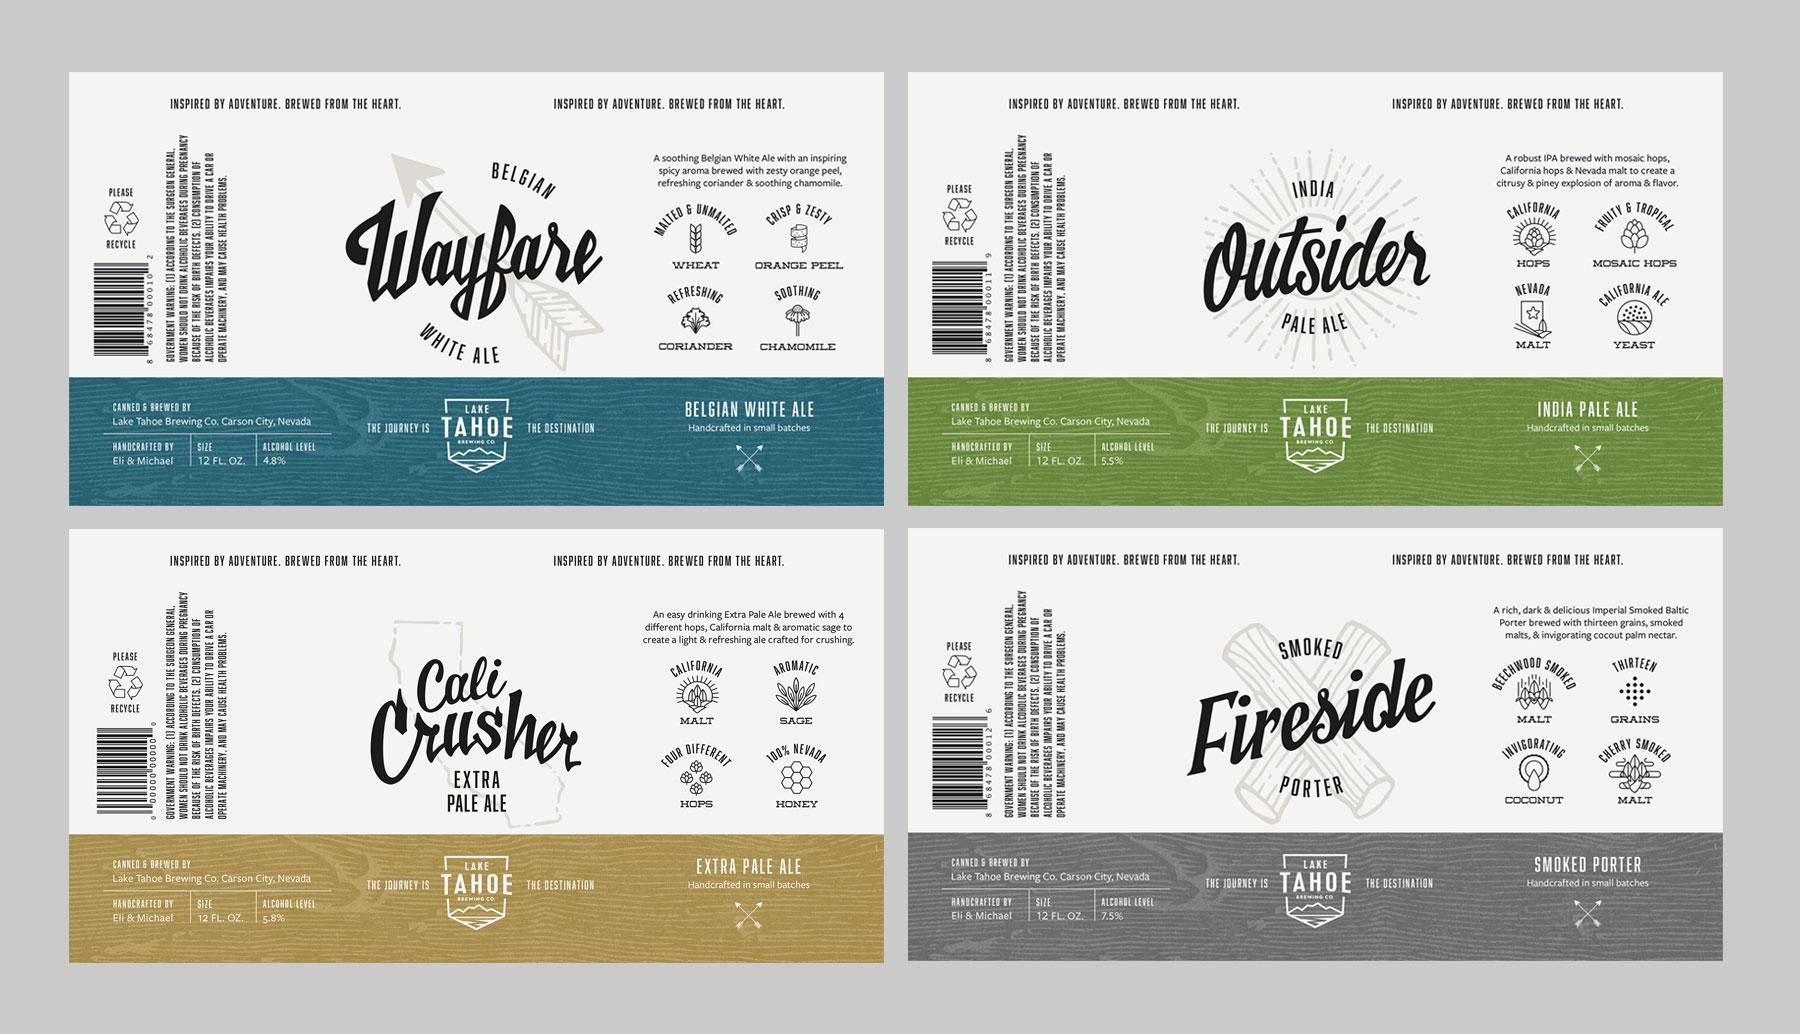 craftbeer-can-design-branding.jpg